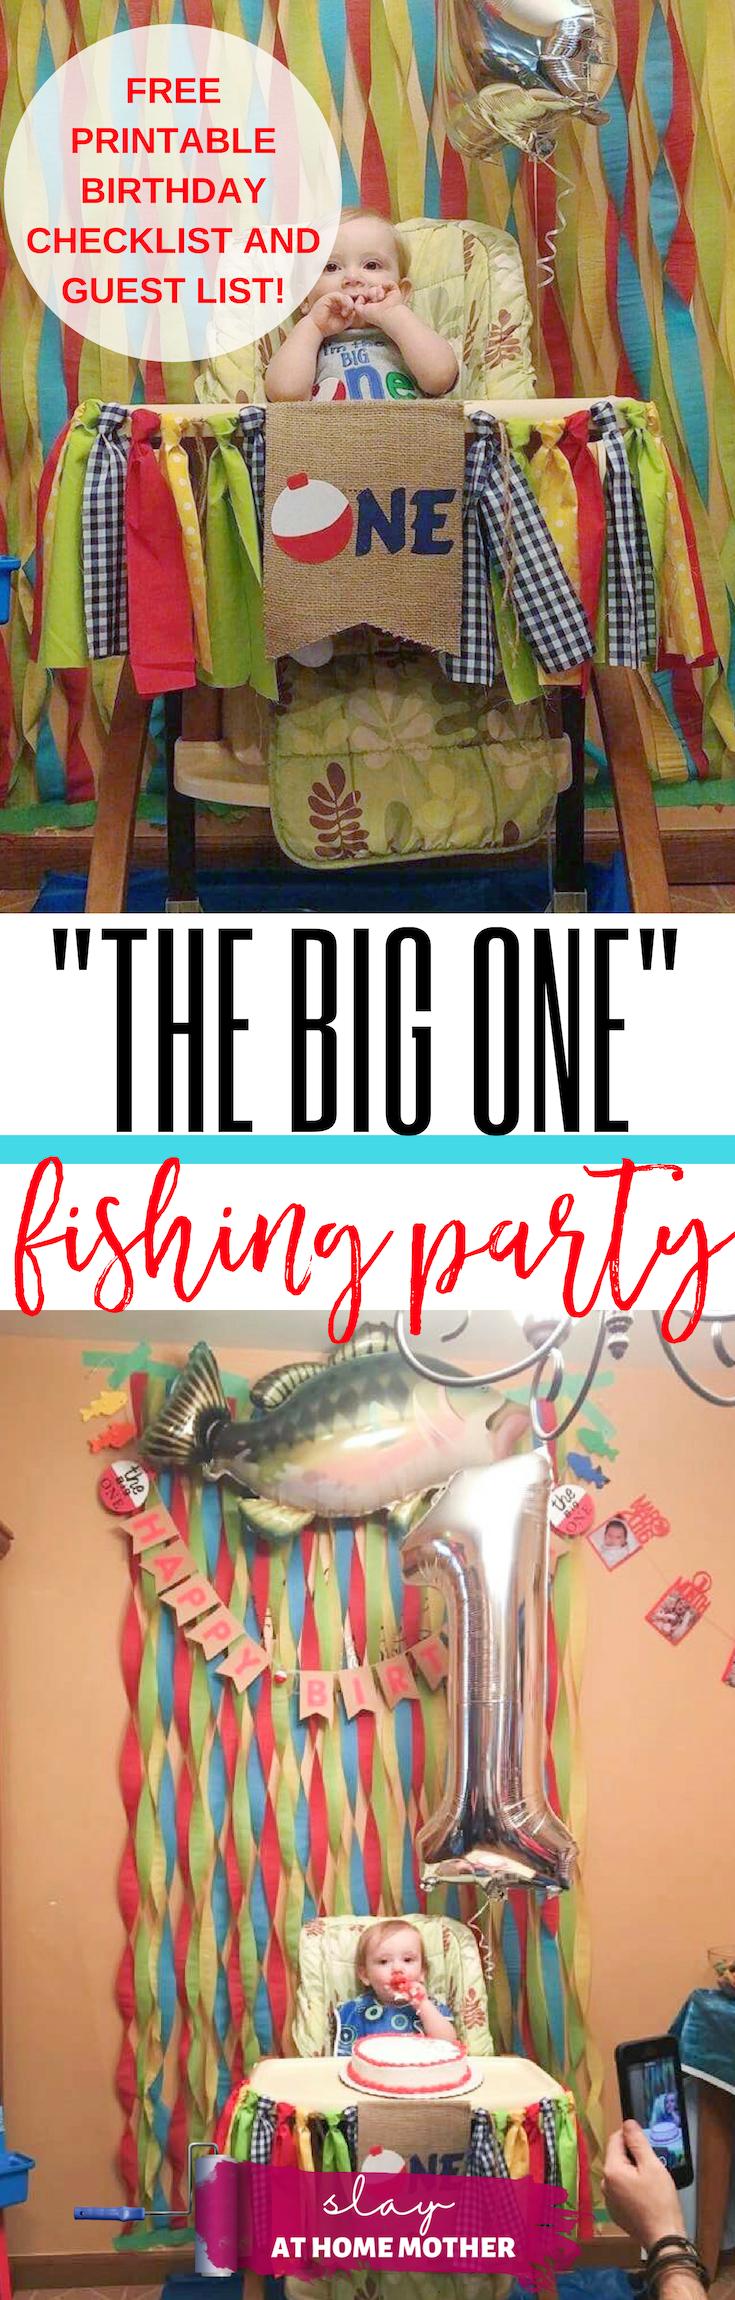 THE BIG ONE Fishing Party Theme (Decor, Favors, & Fun!) + FREE Printable Checklists . #fishingtheme #firstbirthday #thebigone #slayathomemother -- SLAYathomemother.com